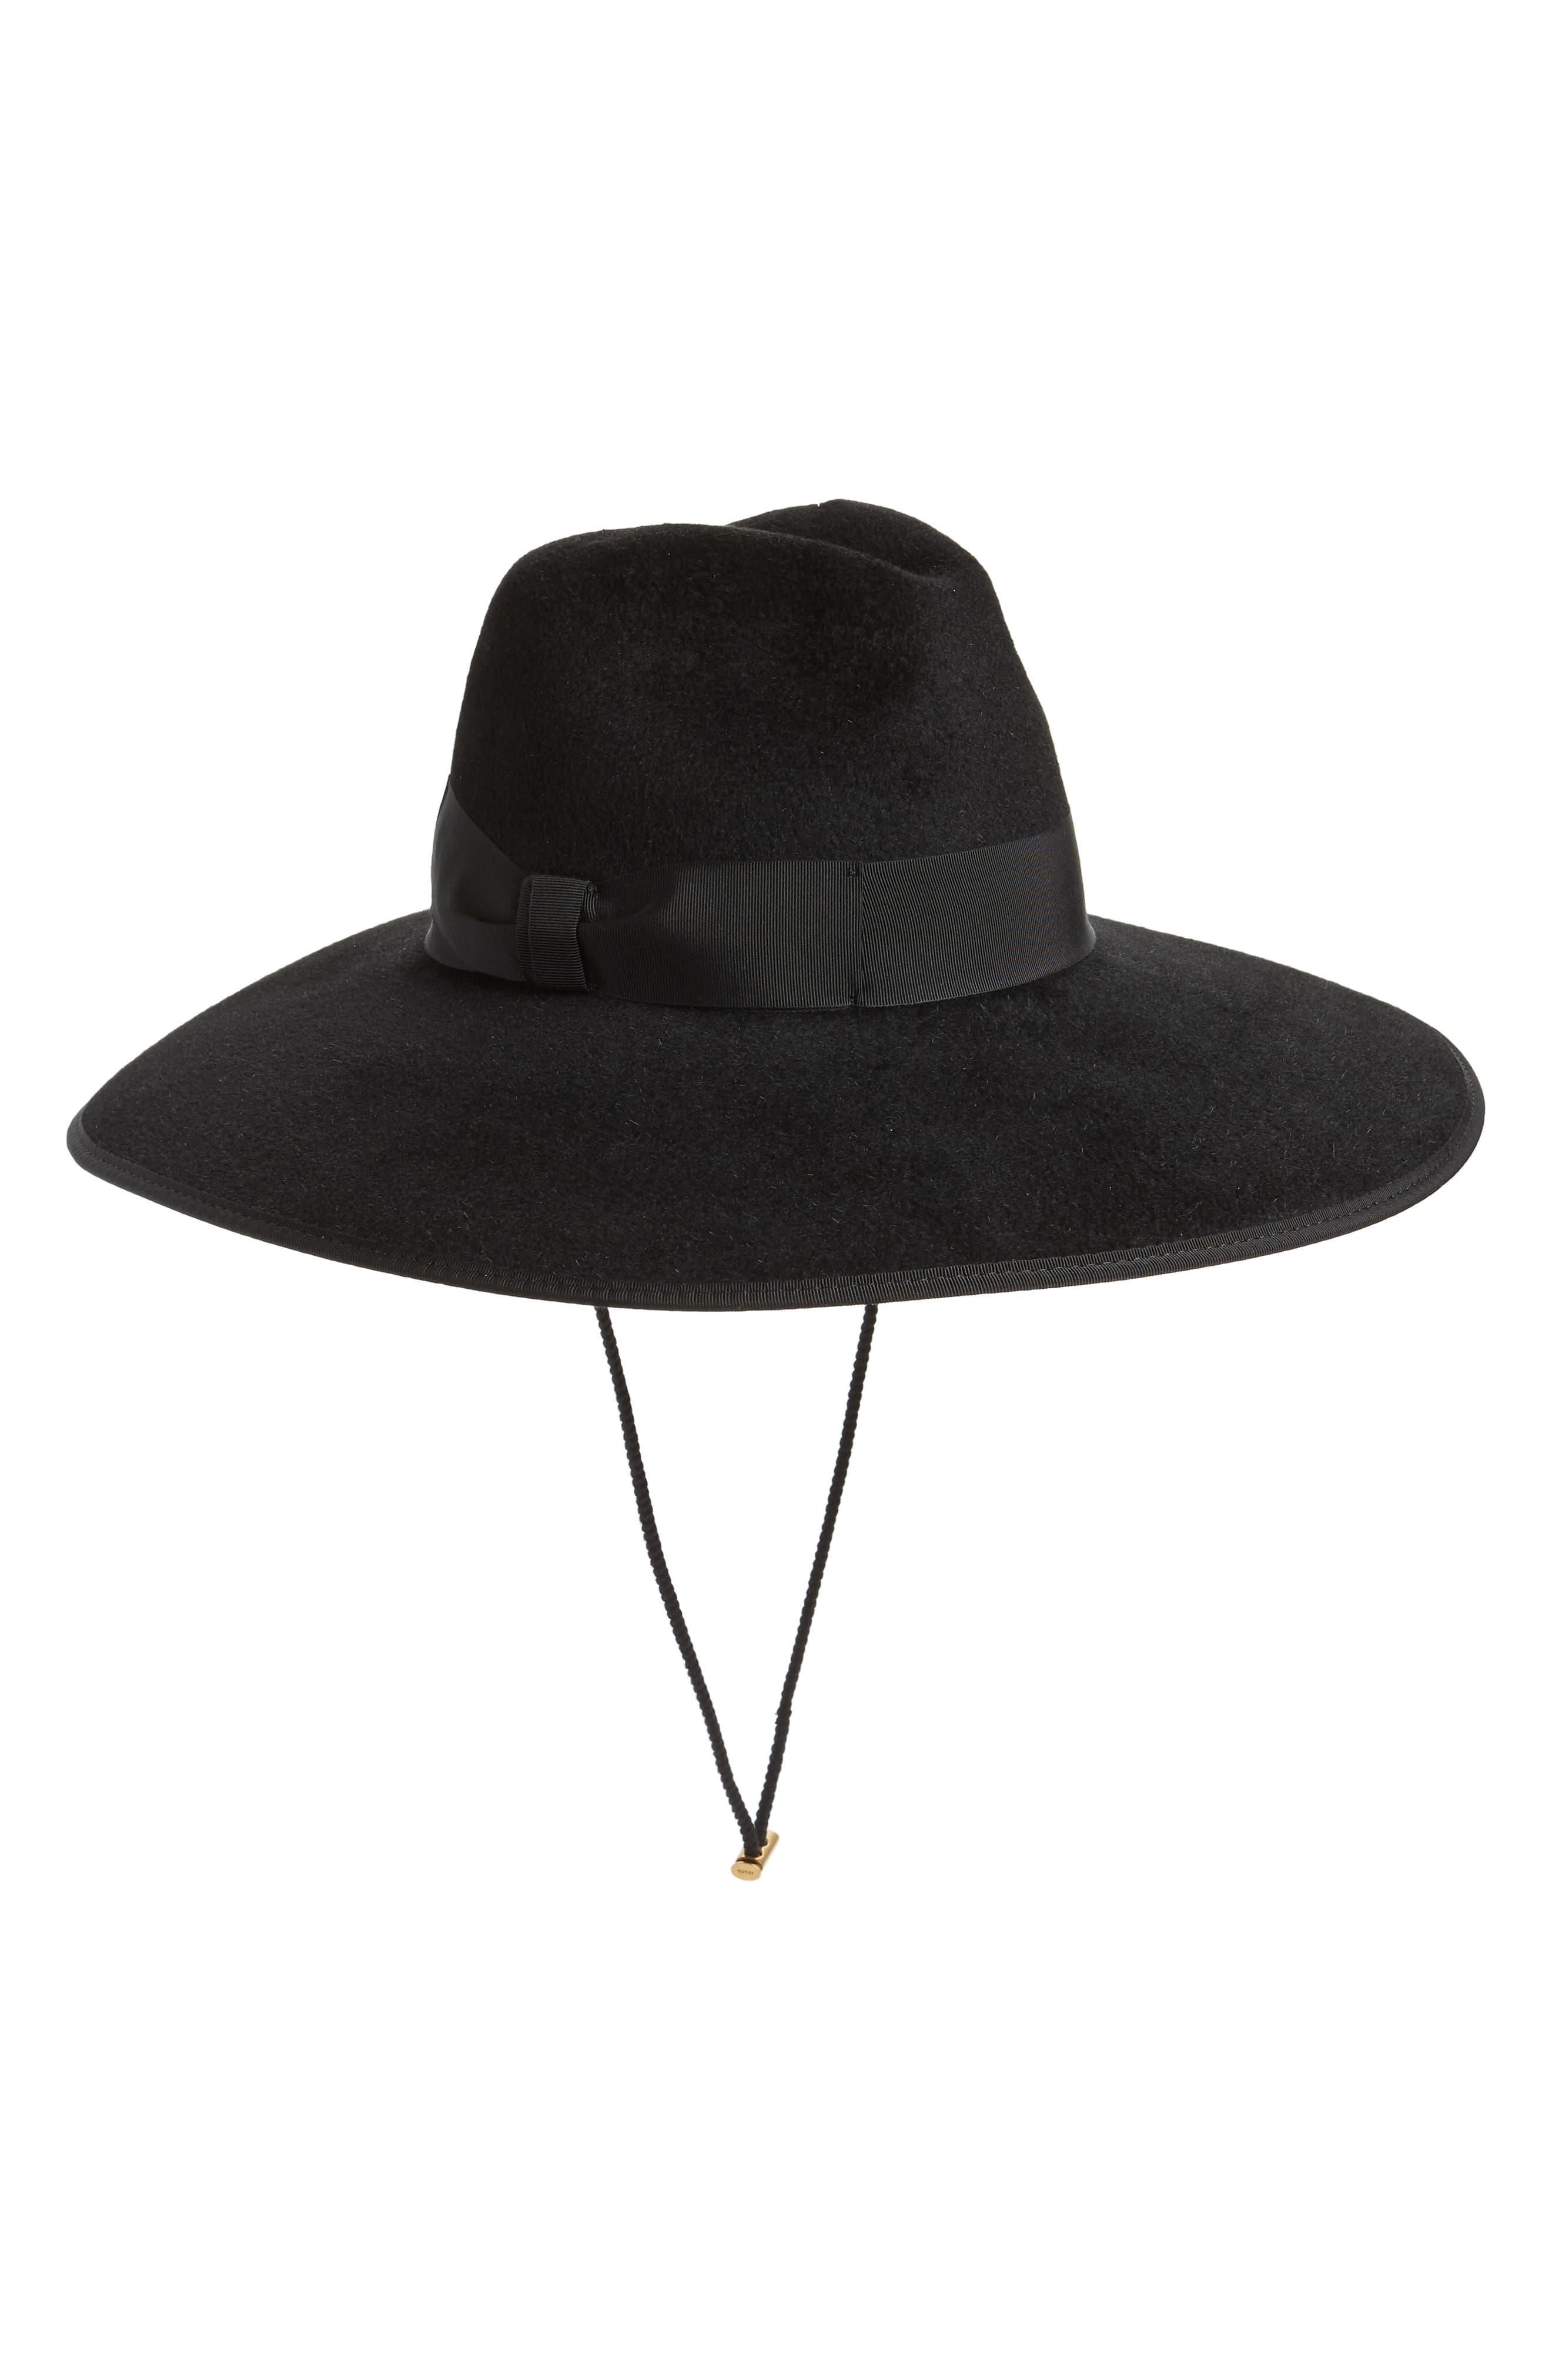 4b26f5f7644 Women's Gucci Sereno Fur Felt Hat - Black Italian Hat, Gucci Designer, Buy  Gucci